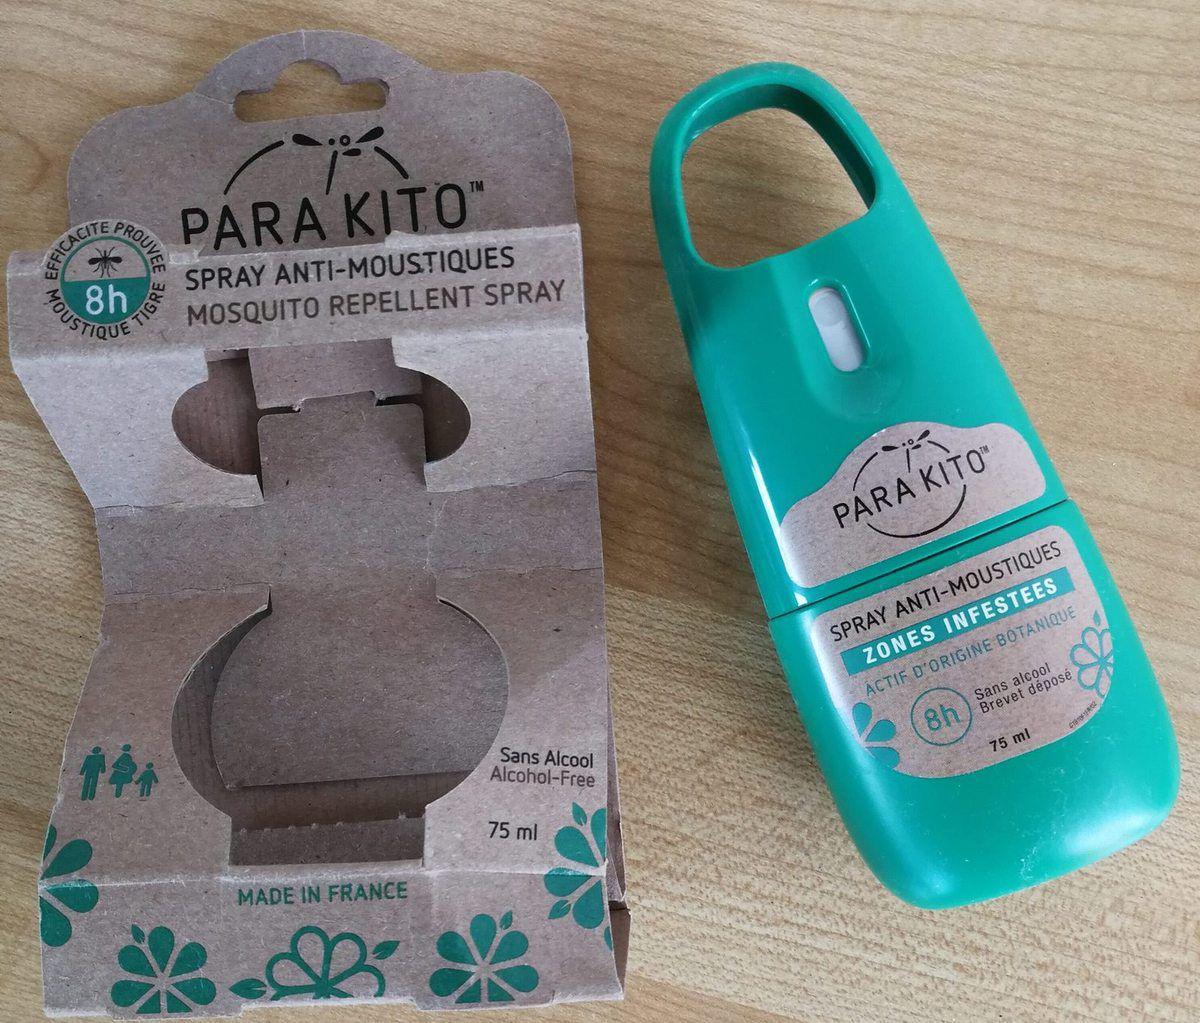 Spray anti moustiques Para'kito